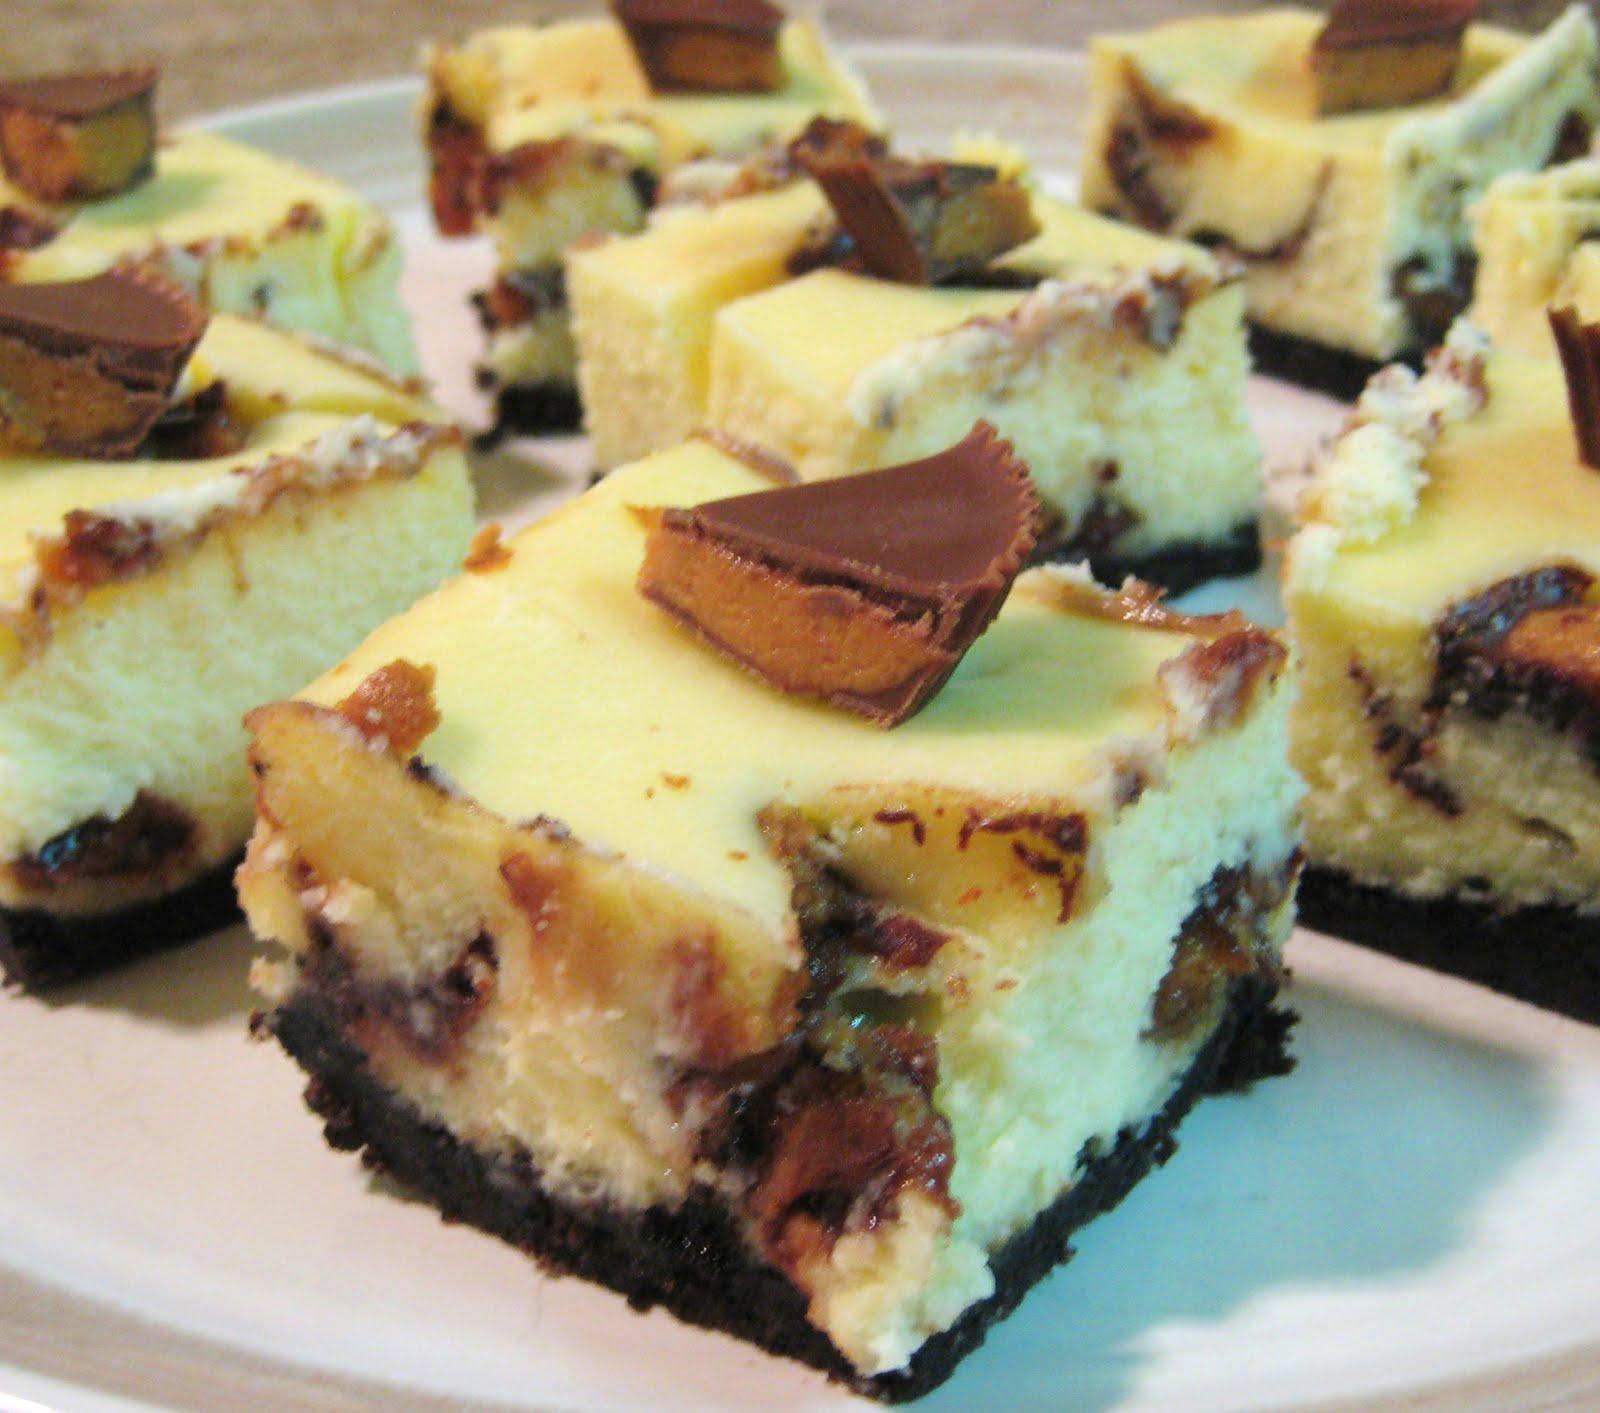 Miranda S Recipes Reese S Peanut Butter Cup Cheesecake Bars